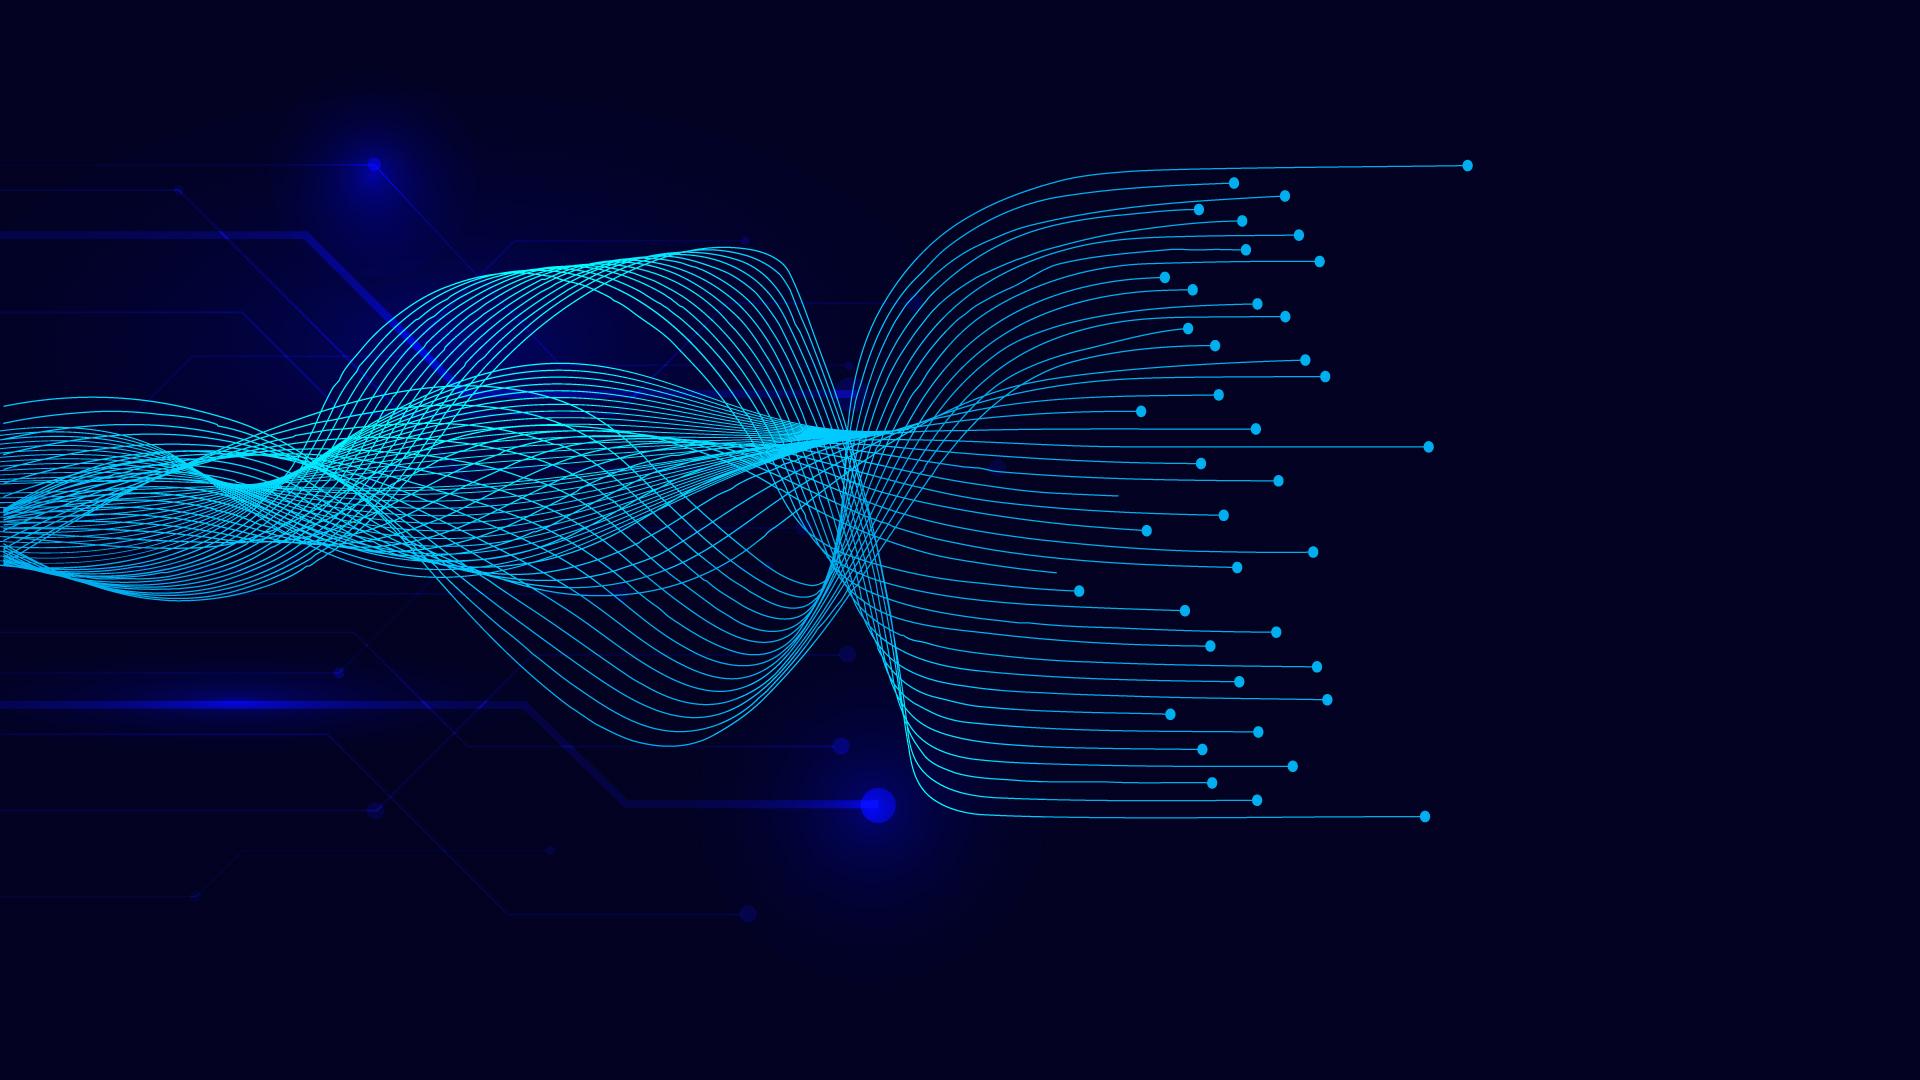 Stream IBM MQ Message Data Across Any Platform with TriggerMesh